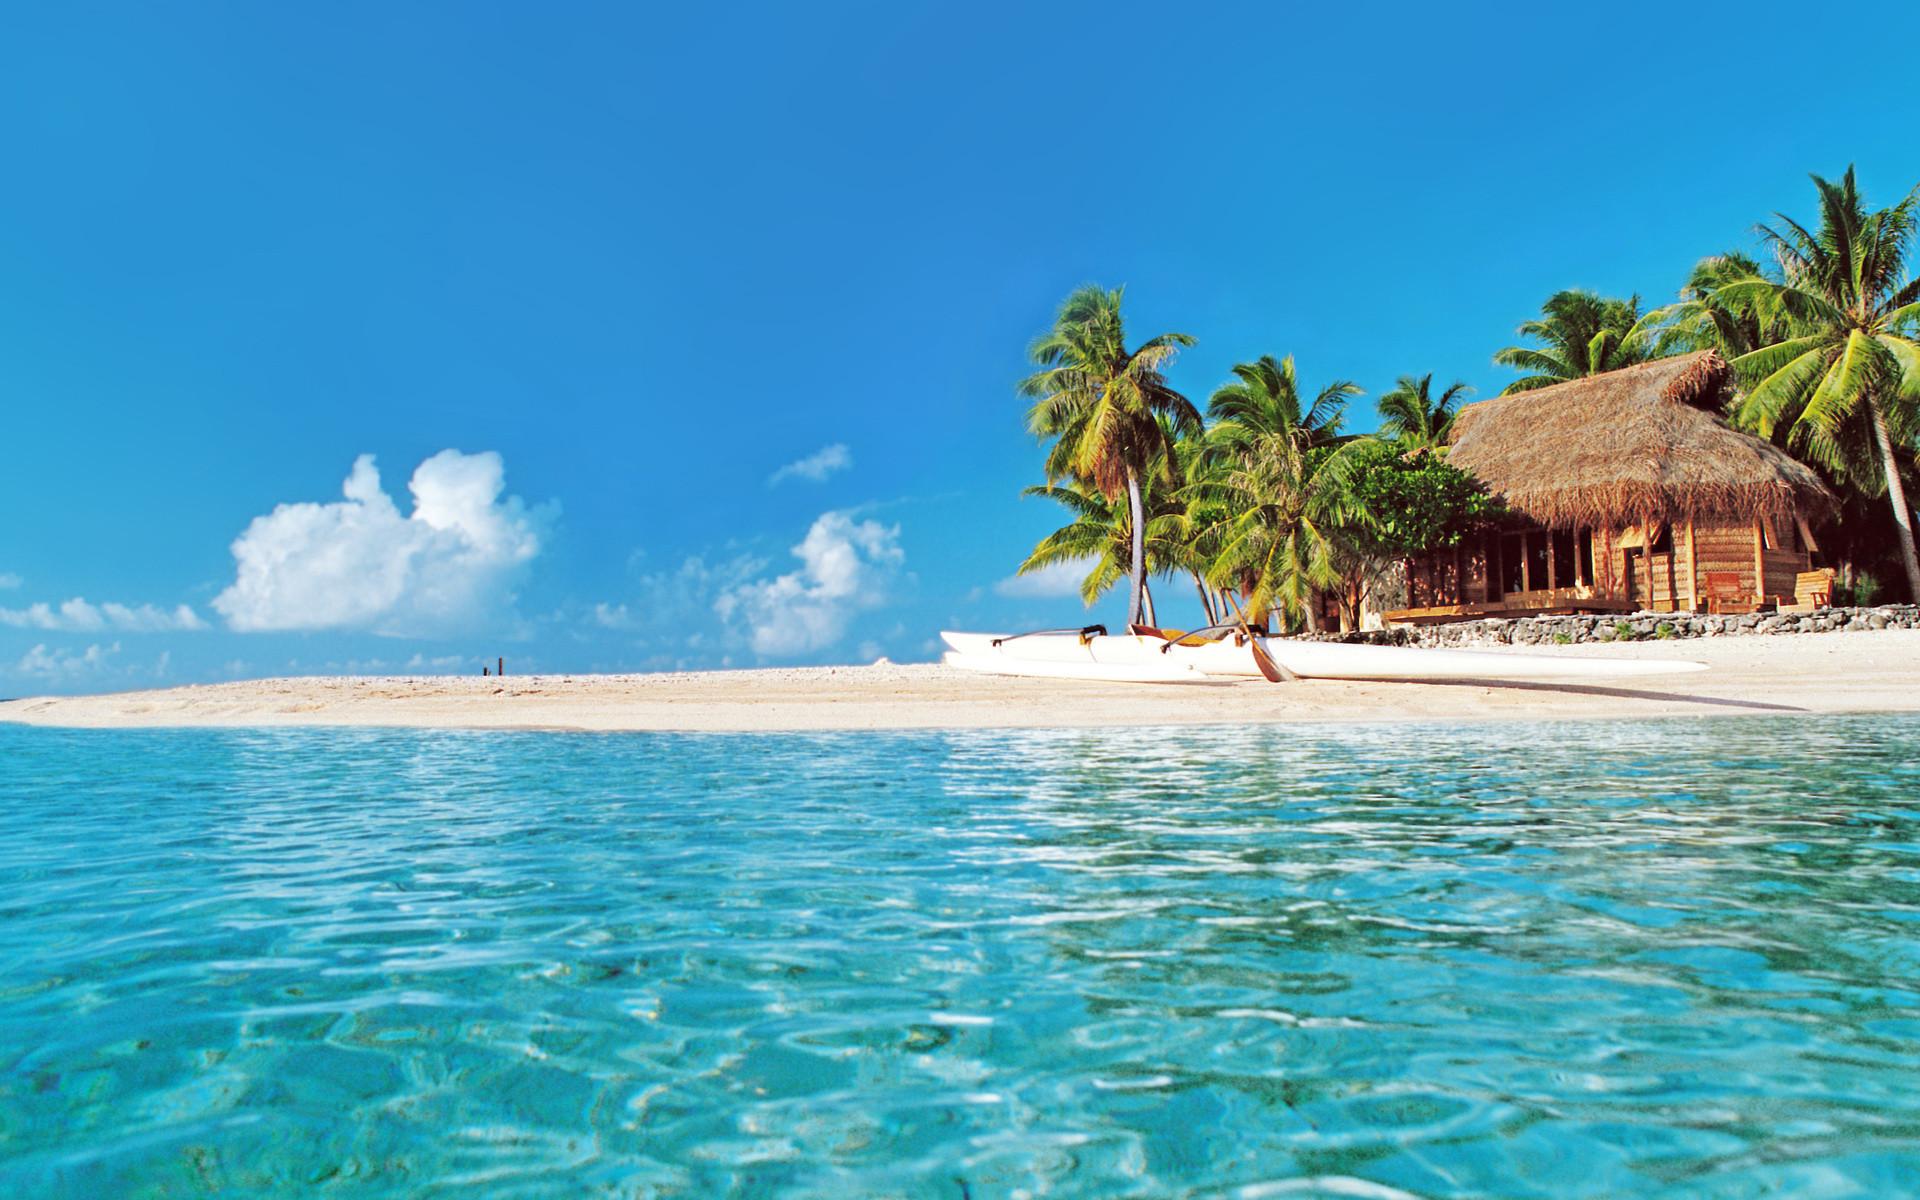 Photography – Beach Canoe Palm Tree Earth Nature Ocean Tropical Hut  Wallpaper